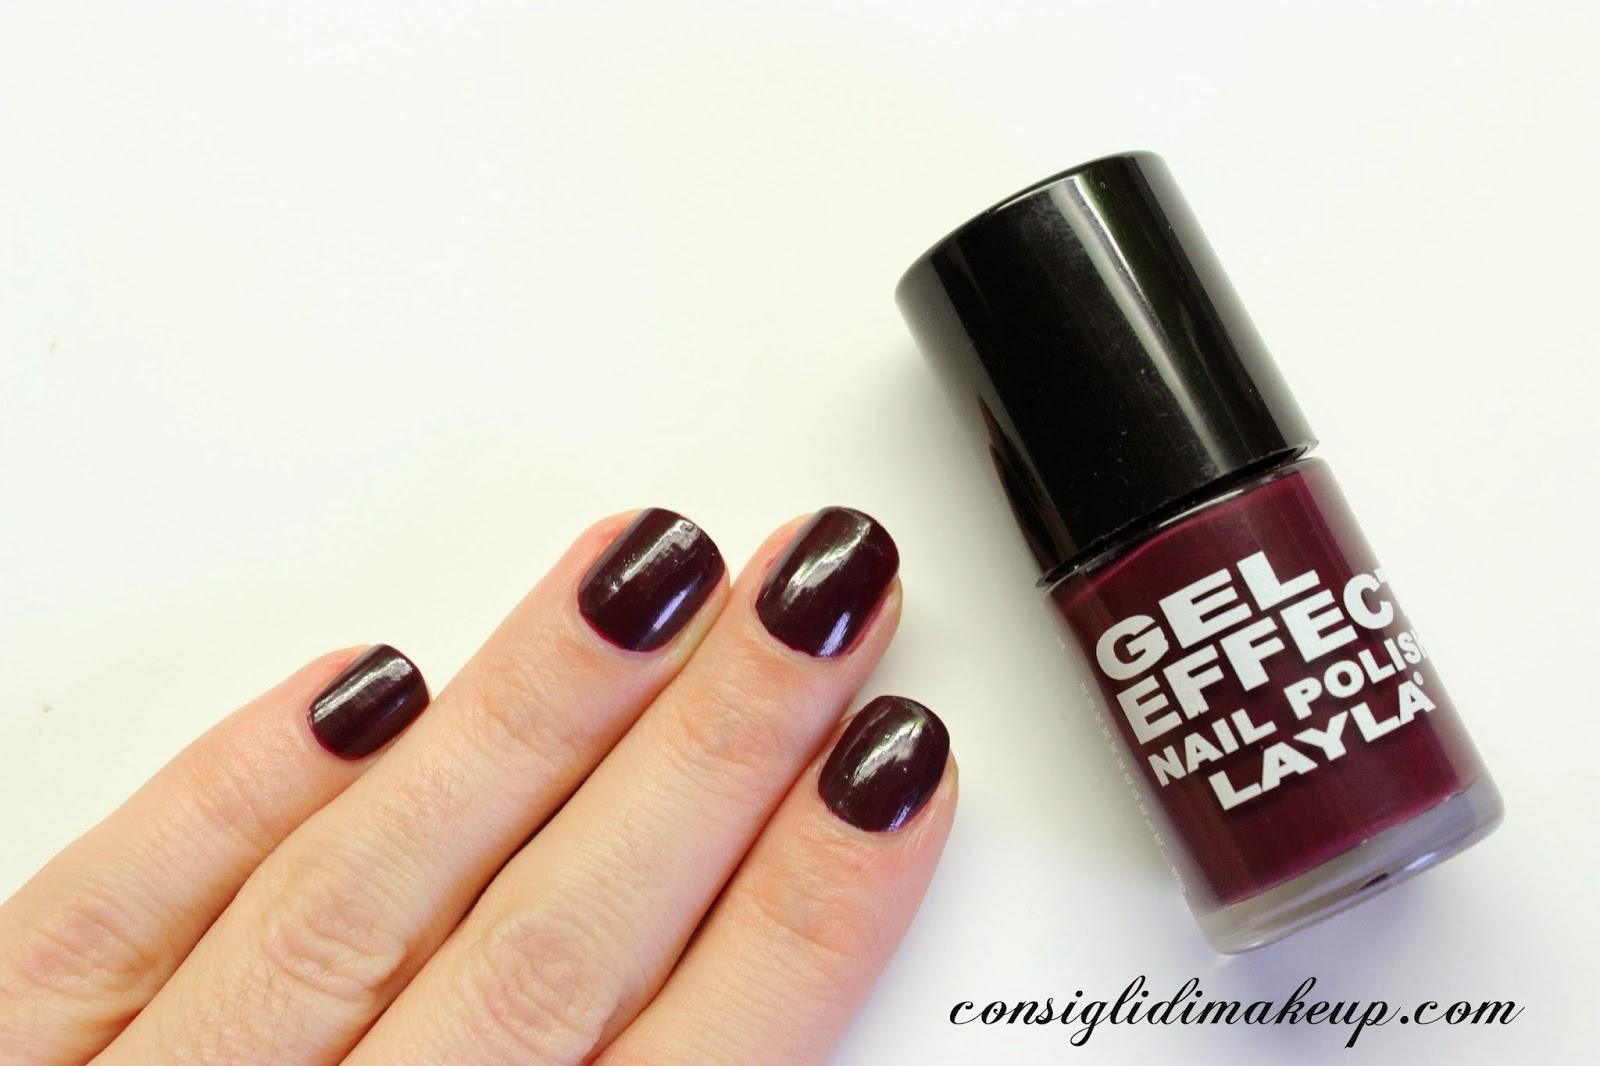 NOTD: Layla - Gel Effect Nail Polish 12 Smooth Purple